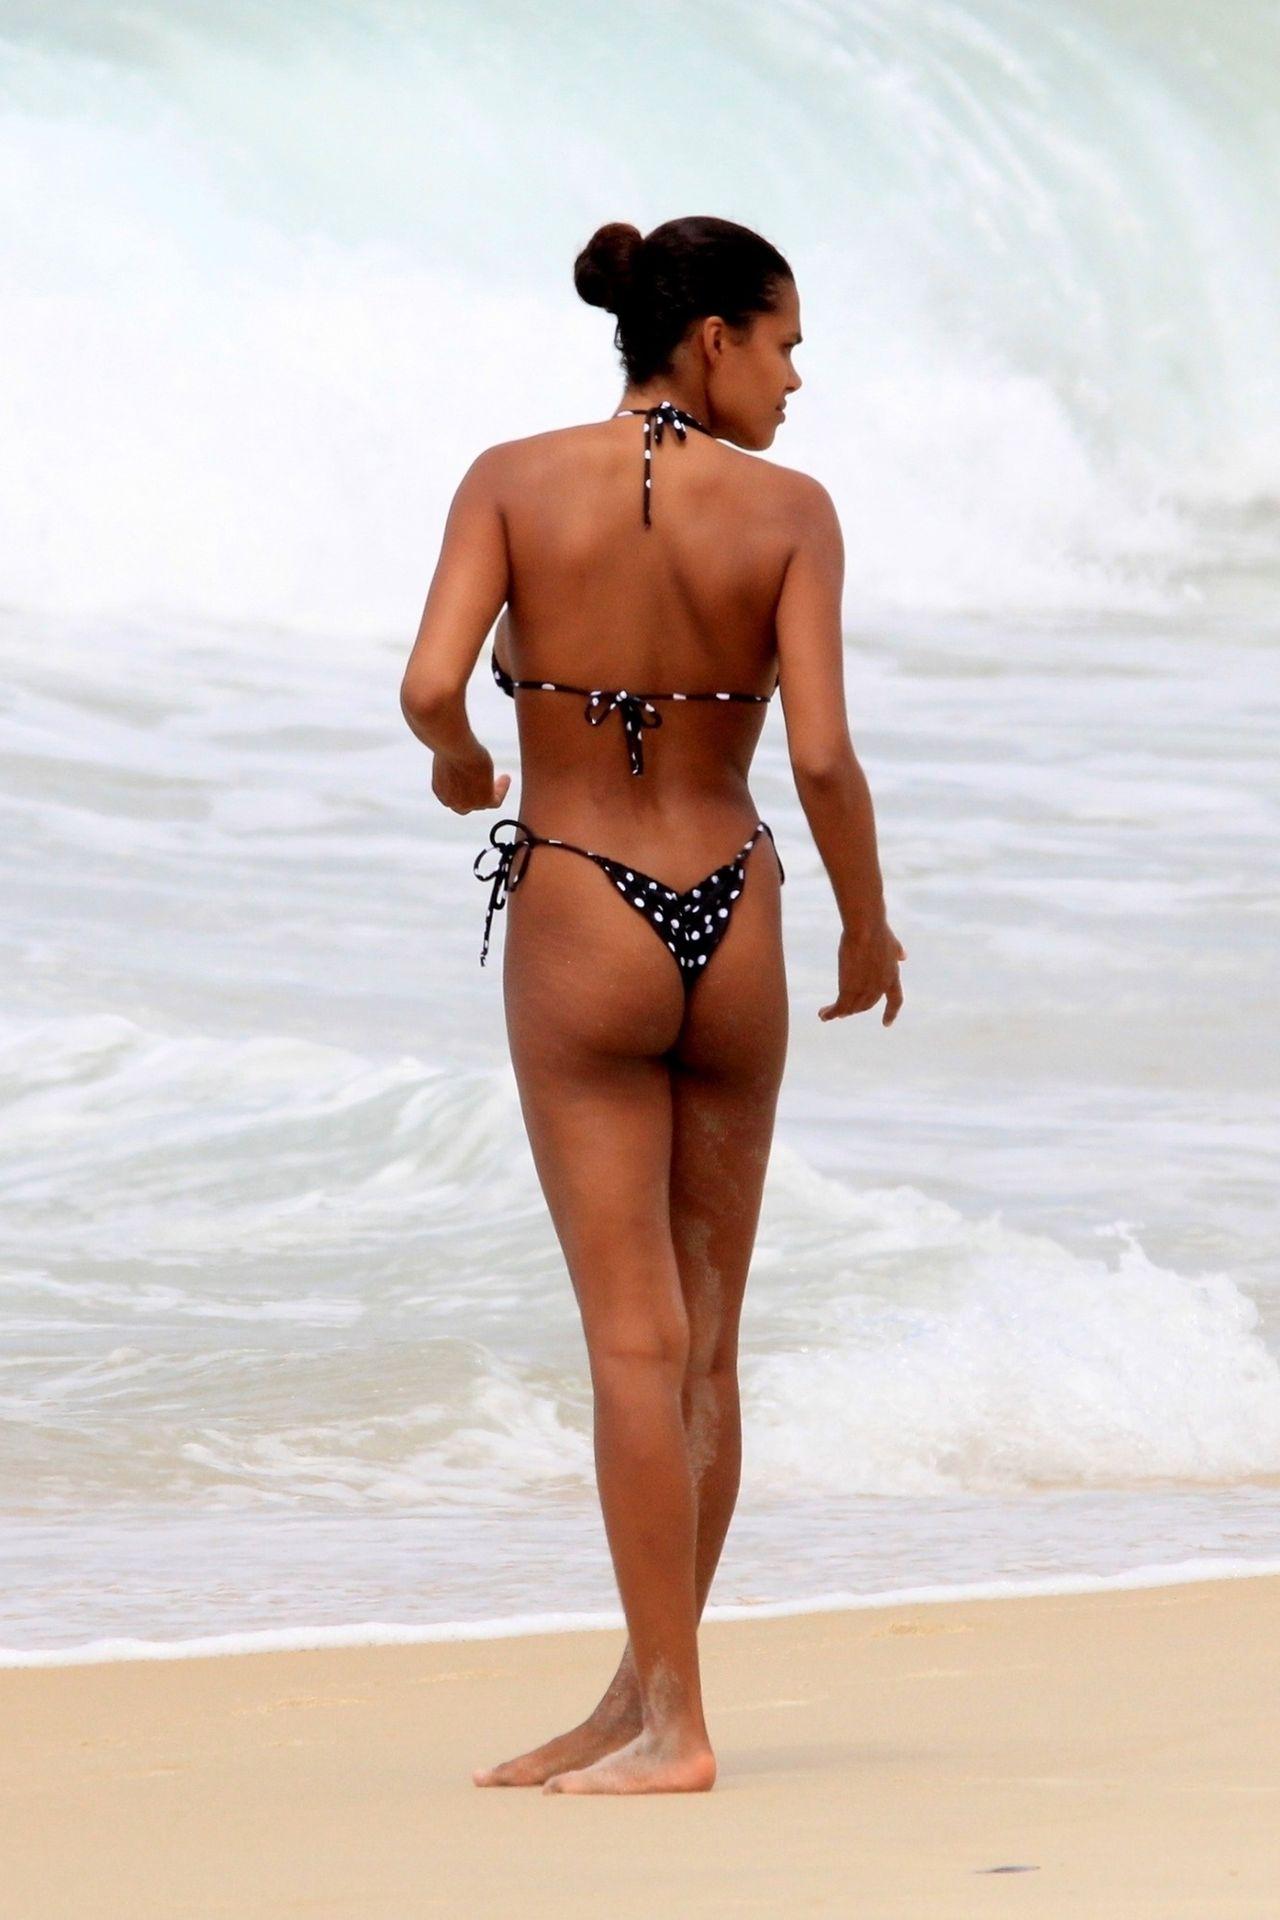 Tina Kunakey Nearly Nip Slip While Frolicking On The Beach In Rio 0051